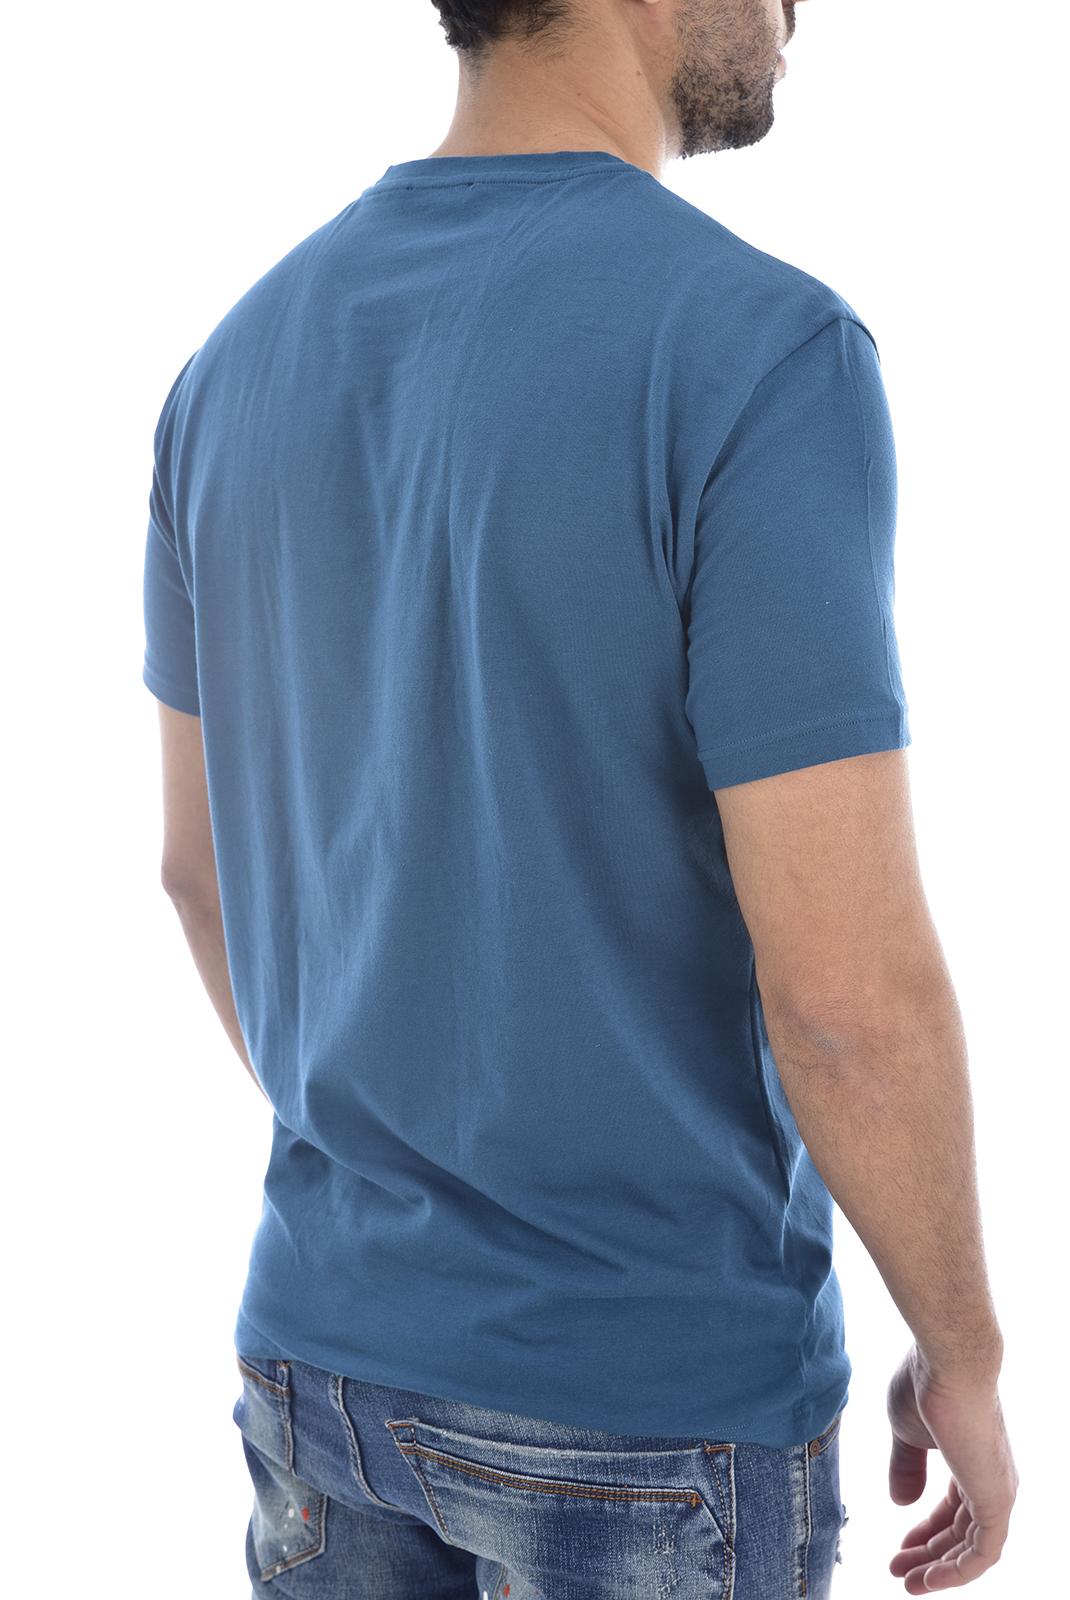 Tee-shirts  Emporio armani 111267 9A720 61935 MARINE/PETROLIO